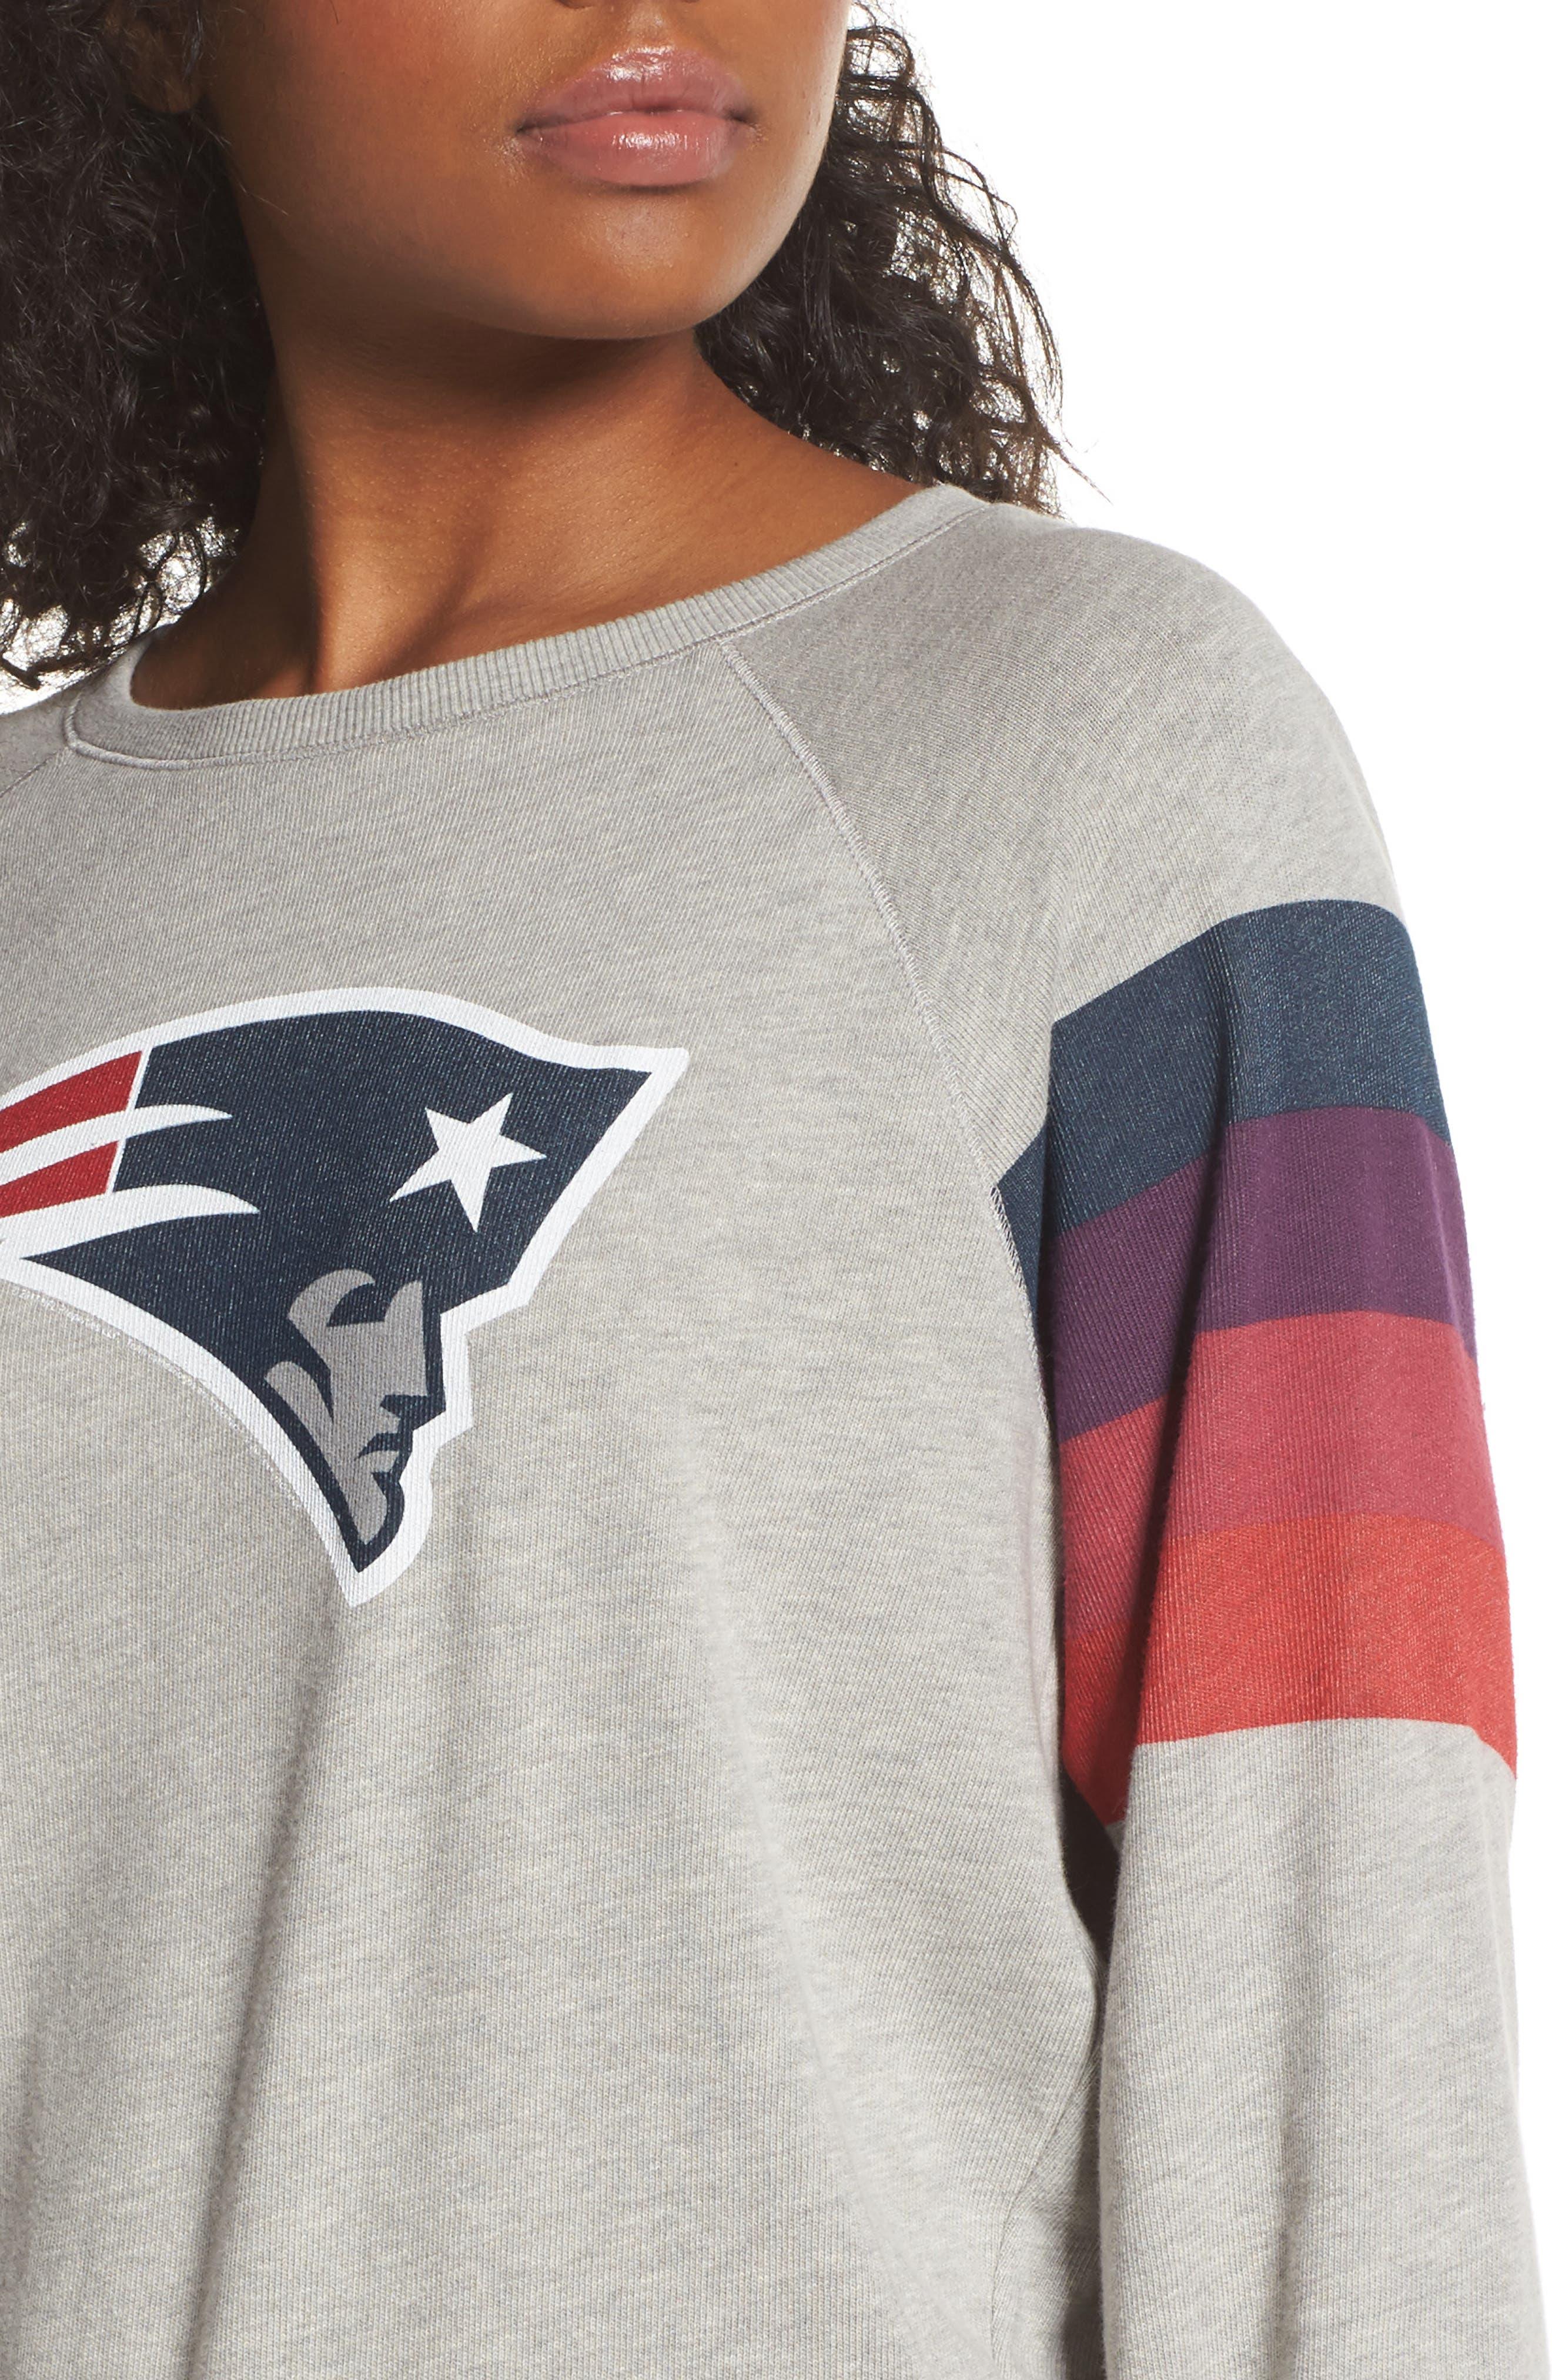 NFL New England Patriots Hacci Sweatshirt,                             Alternate thumbnail 4, color,                             030